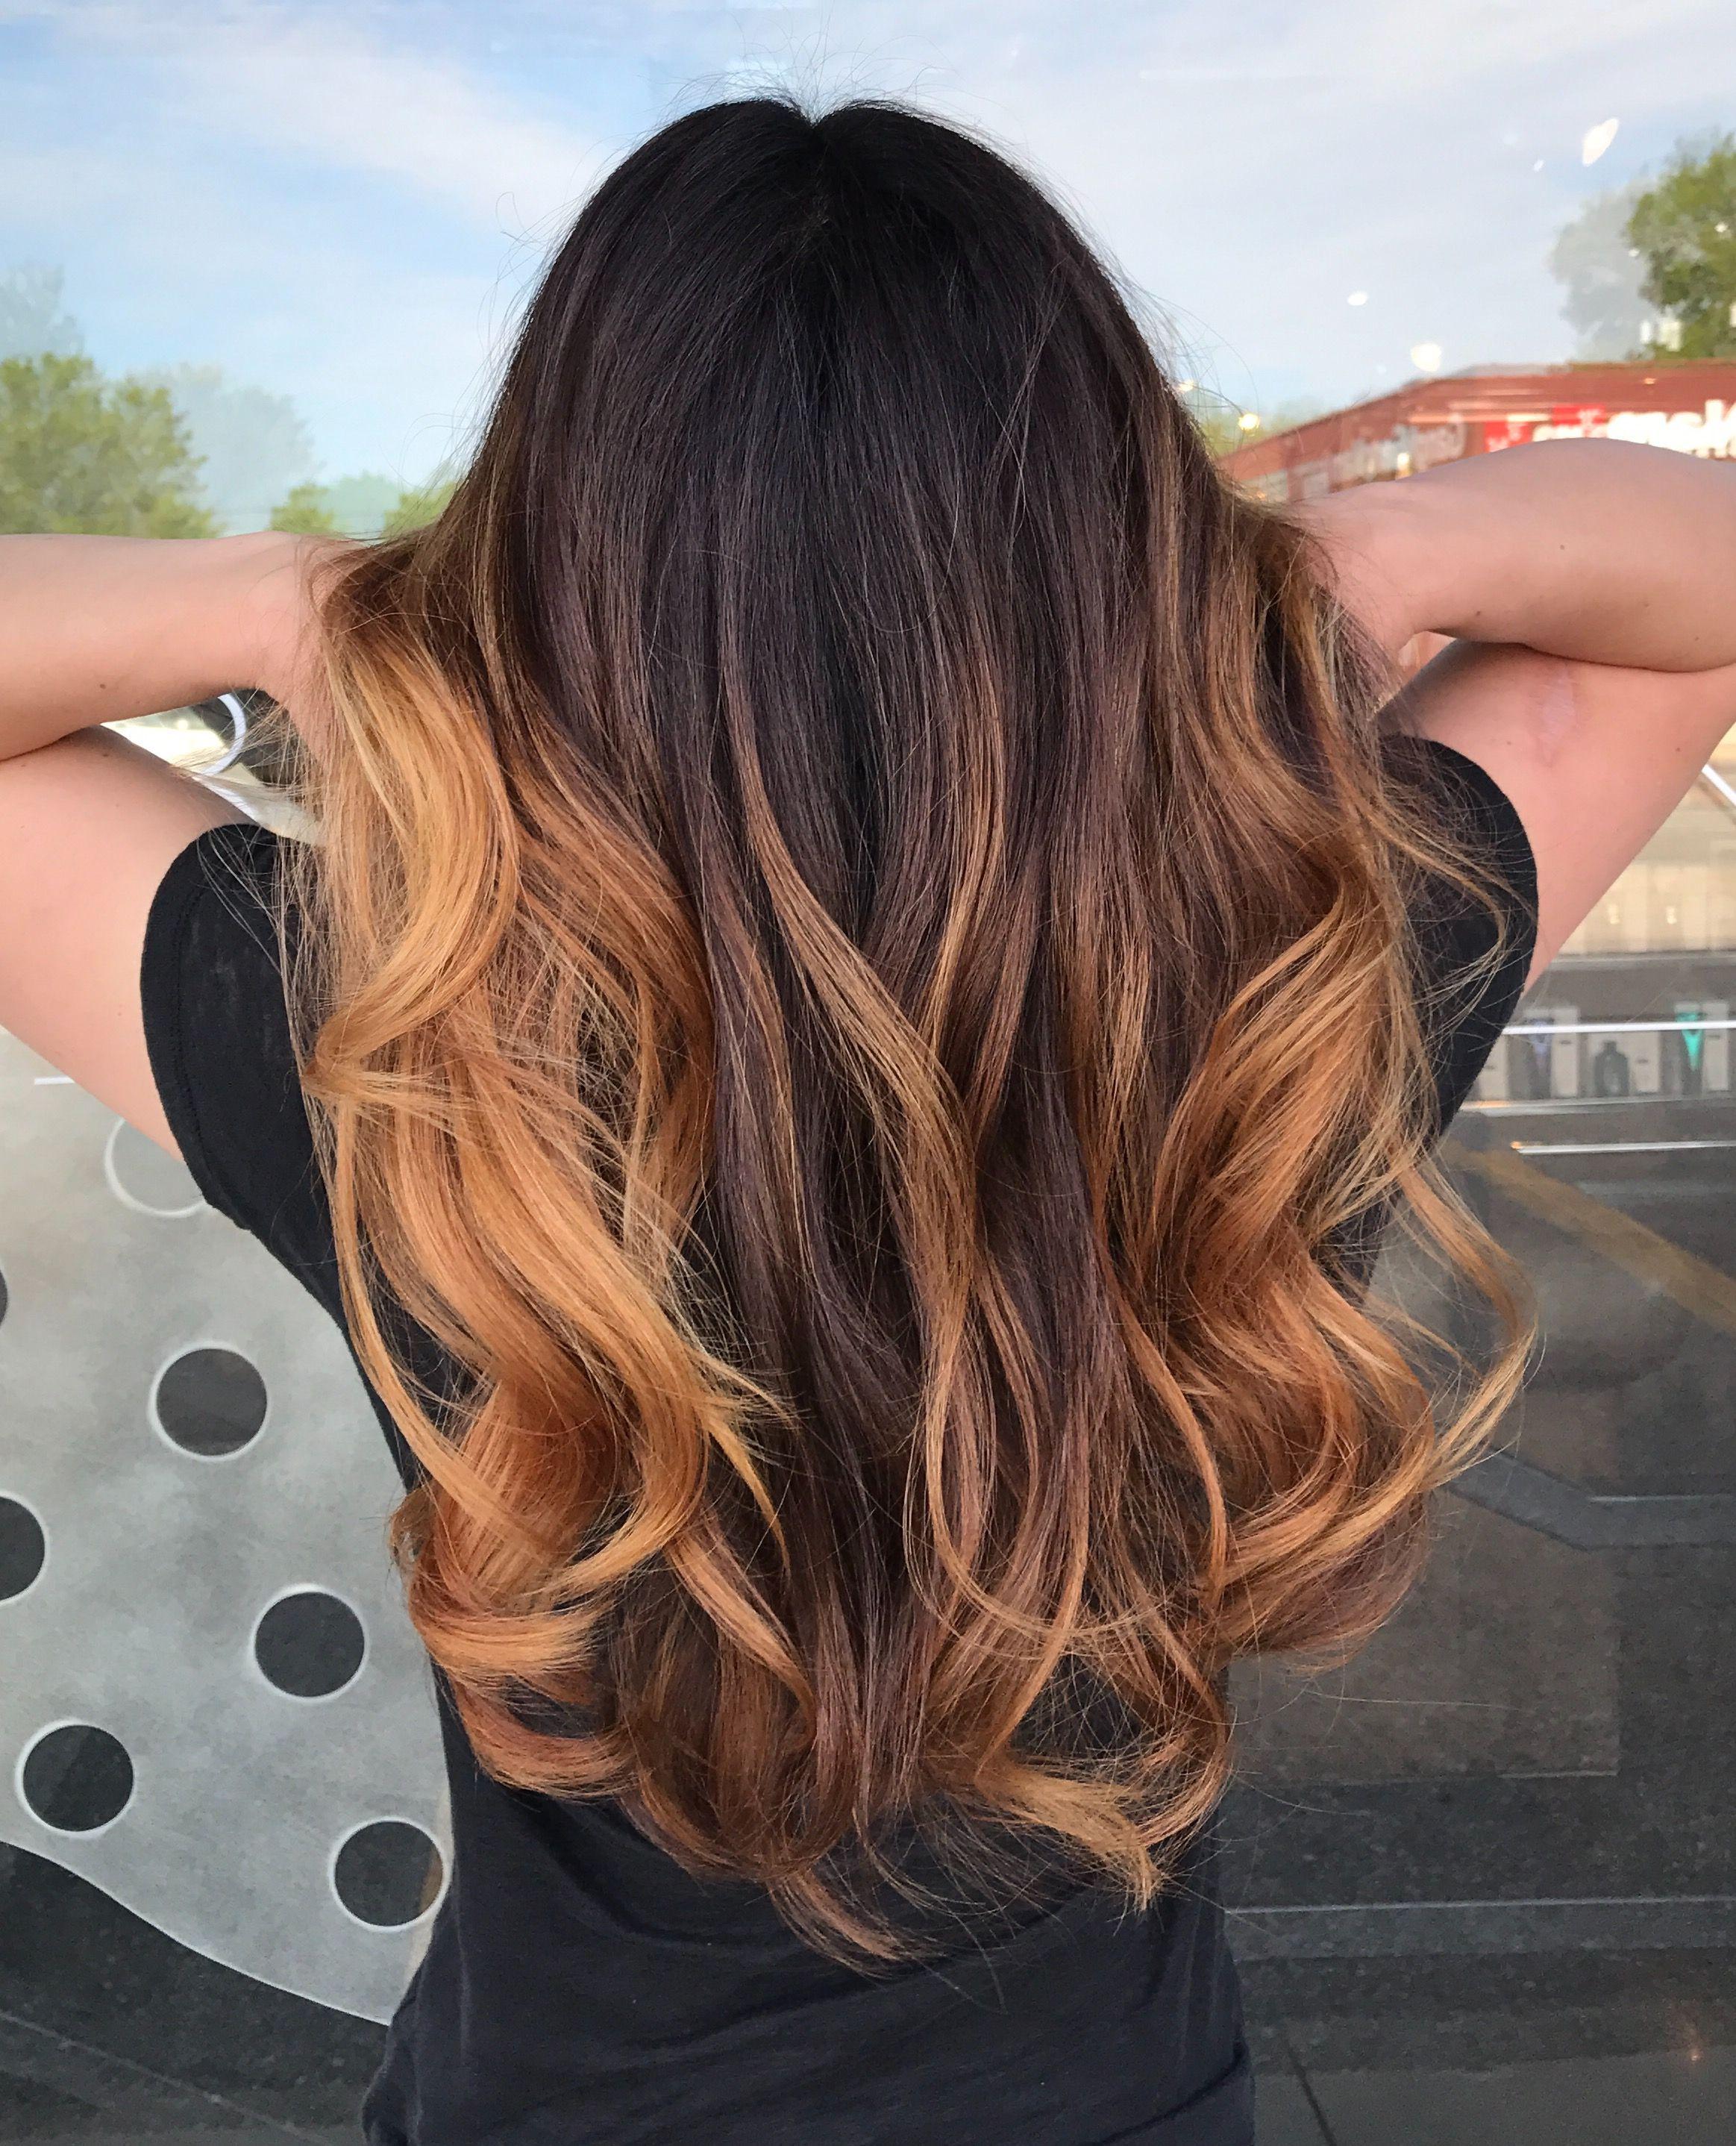 Caramel Balayage On Long Dark Brown Hair Sun Kissed Summer 2017 Hair Color Balayage Hair Balayage Hair Caramel Balayage Hair Dark